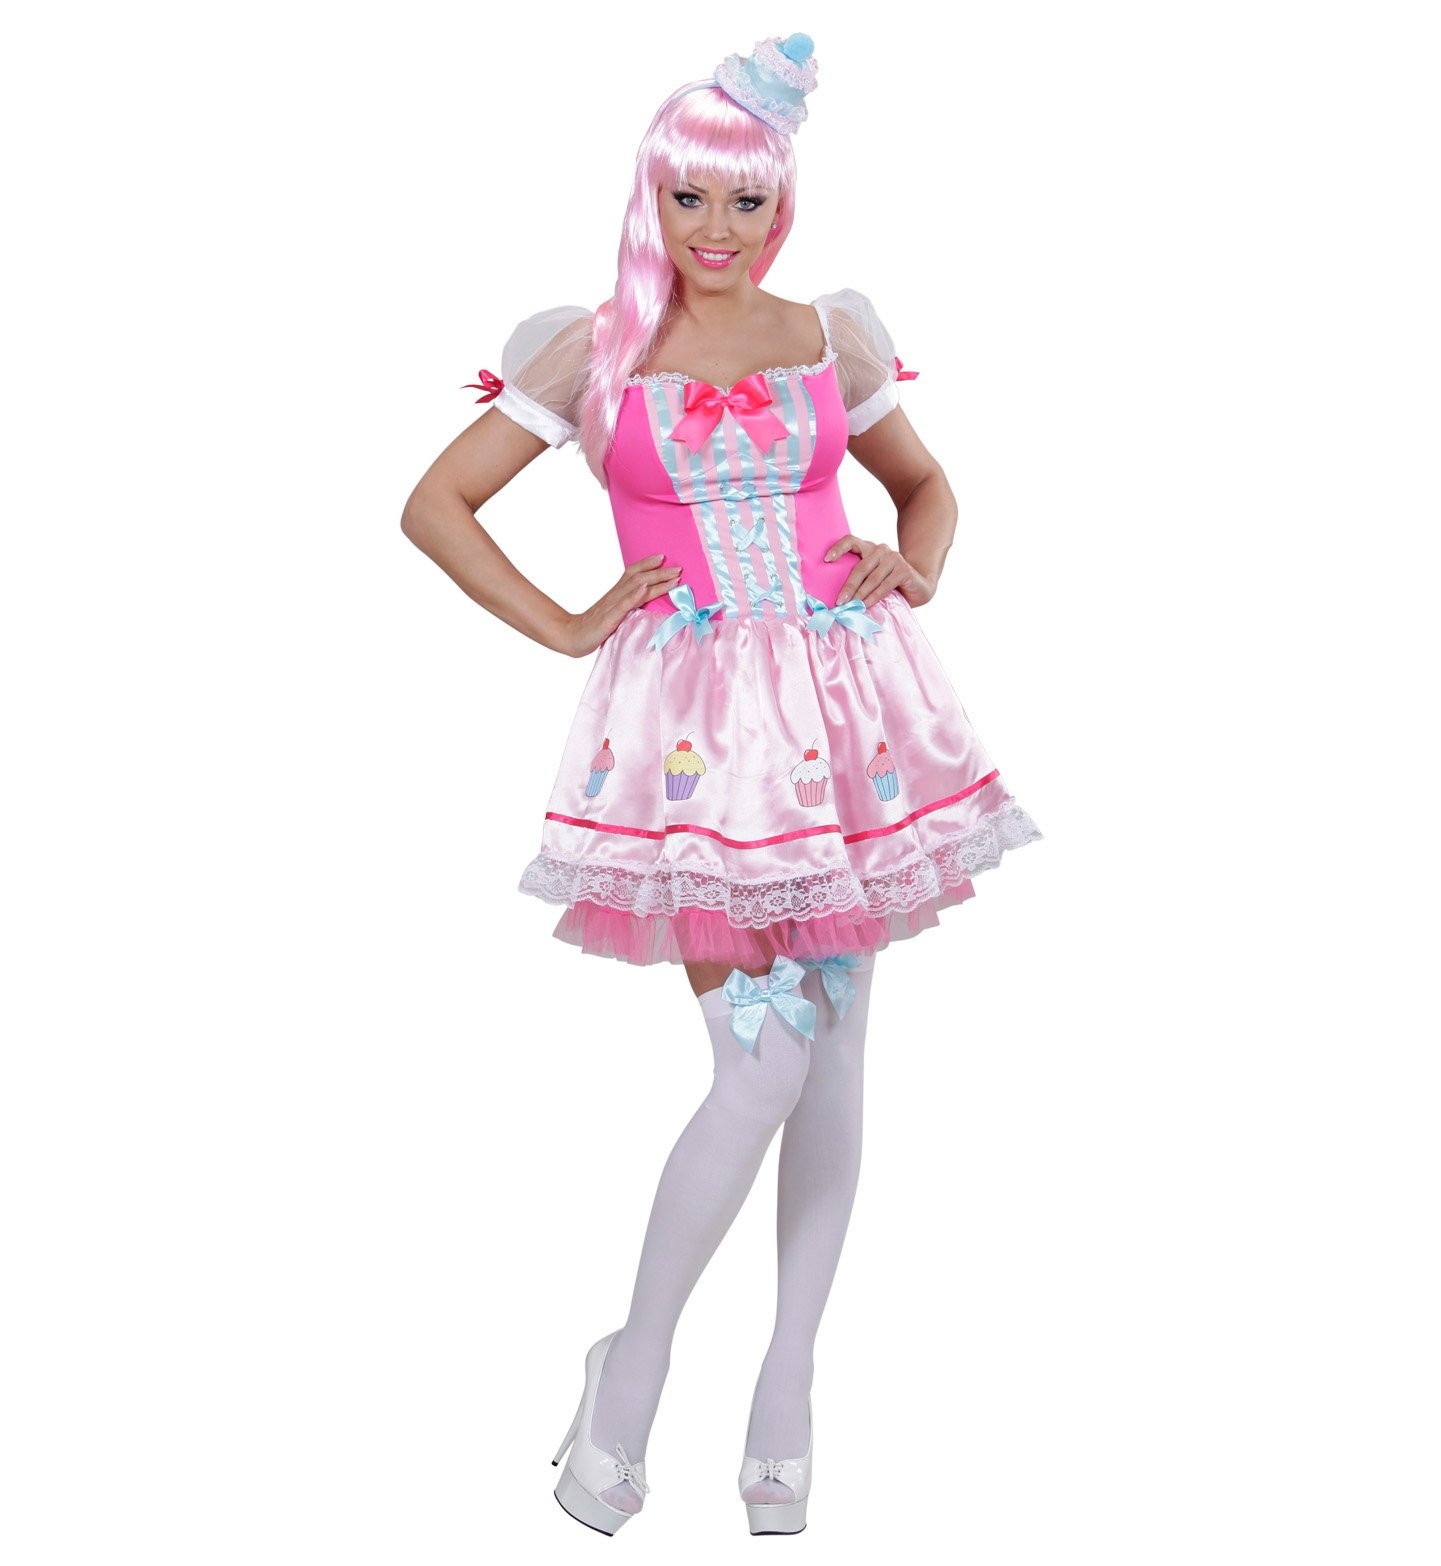 WIDMANN Sancto Disfraz Chica Cupcake Carnaval